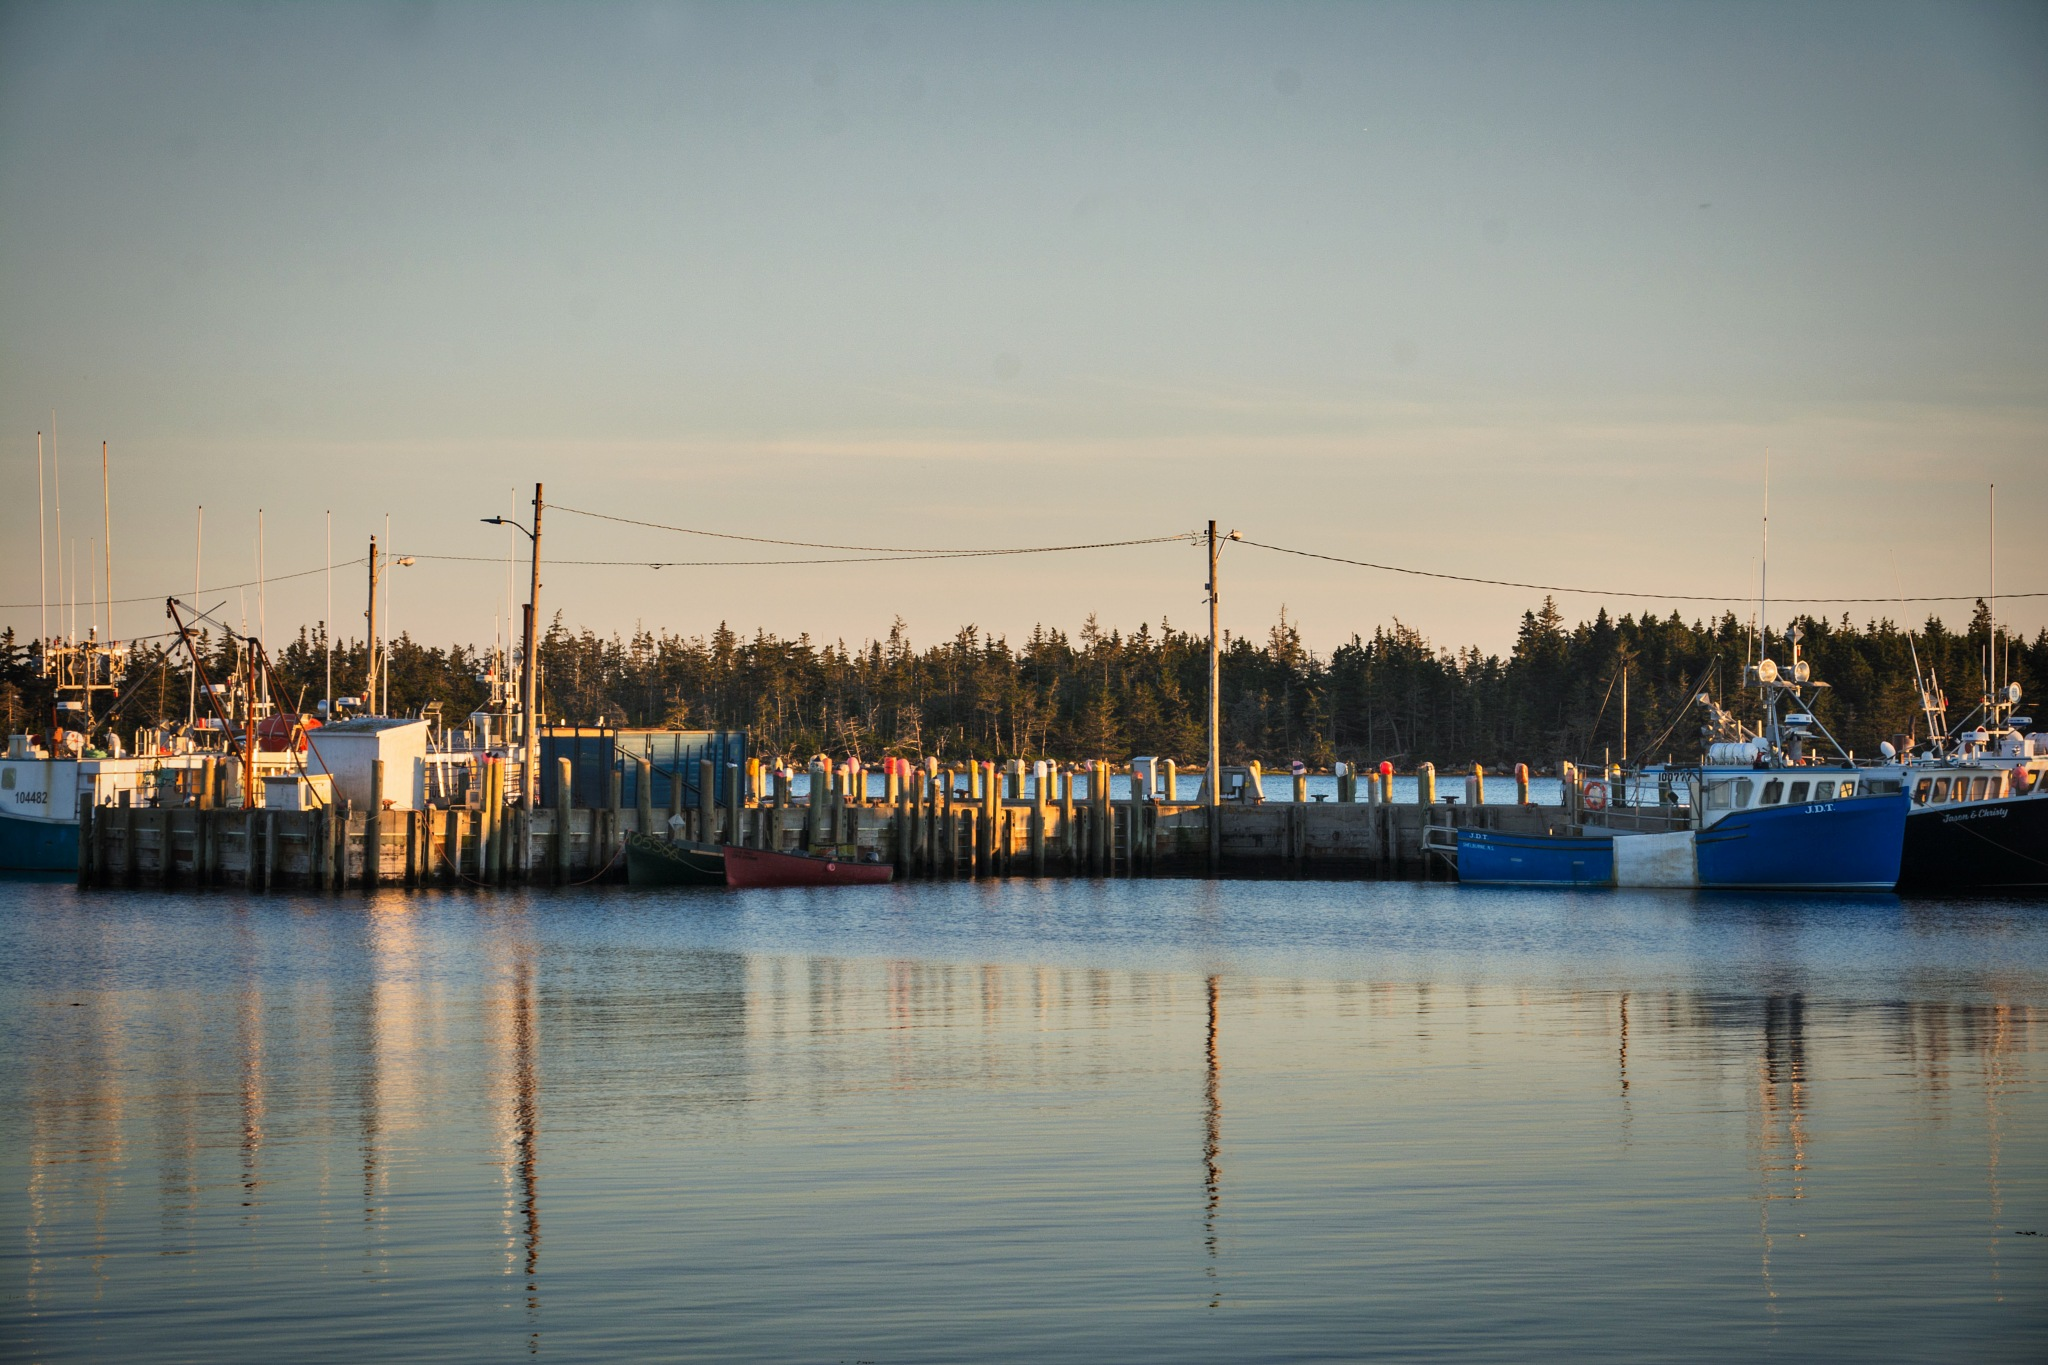 Cape Sable Island Wharf by Wayne L. Talbot